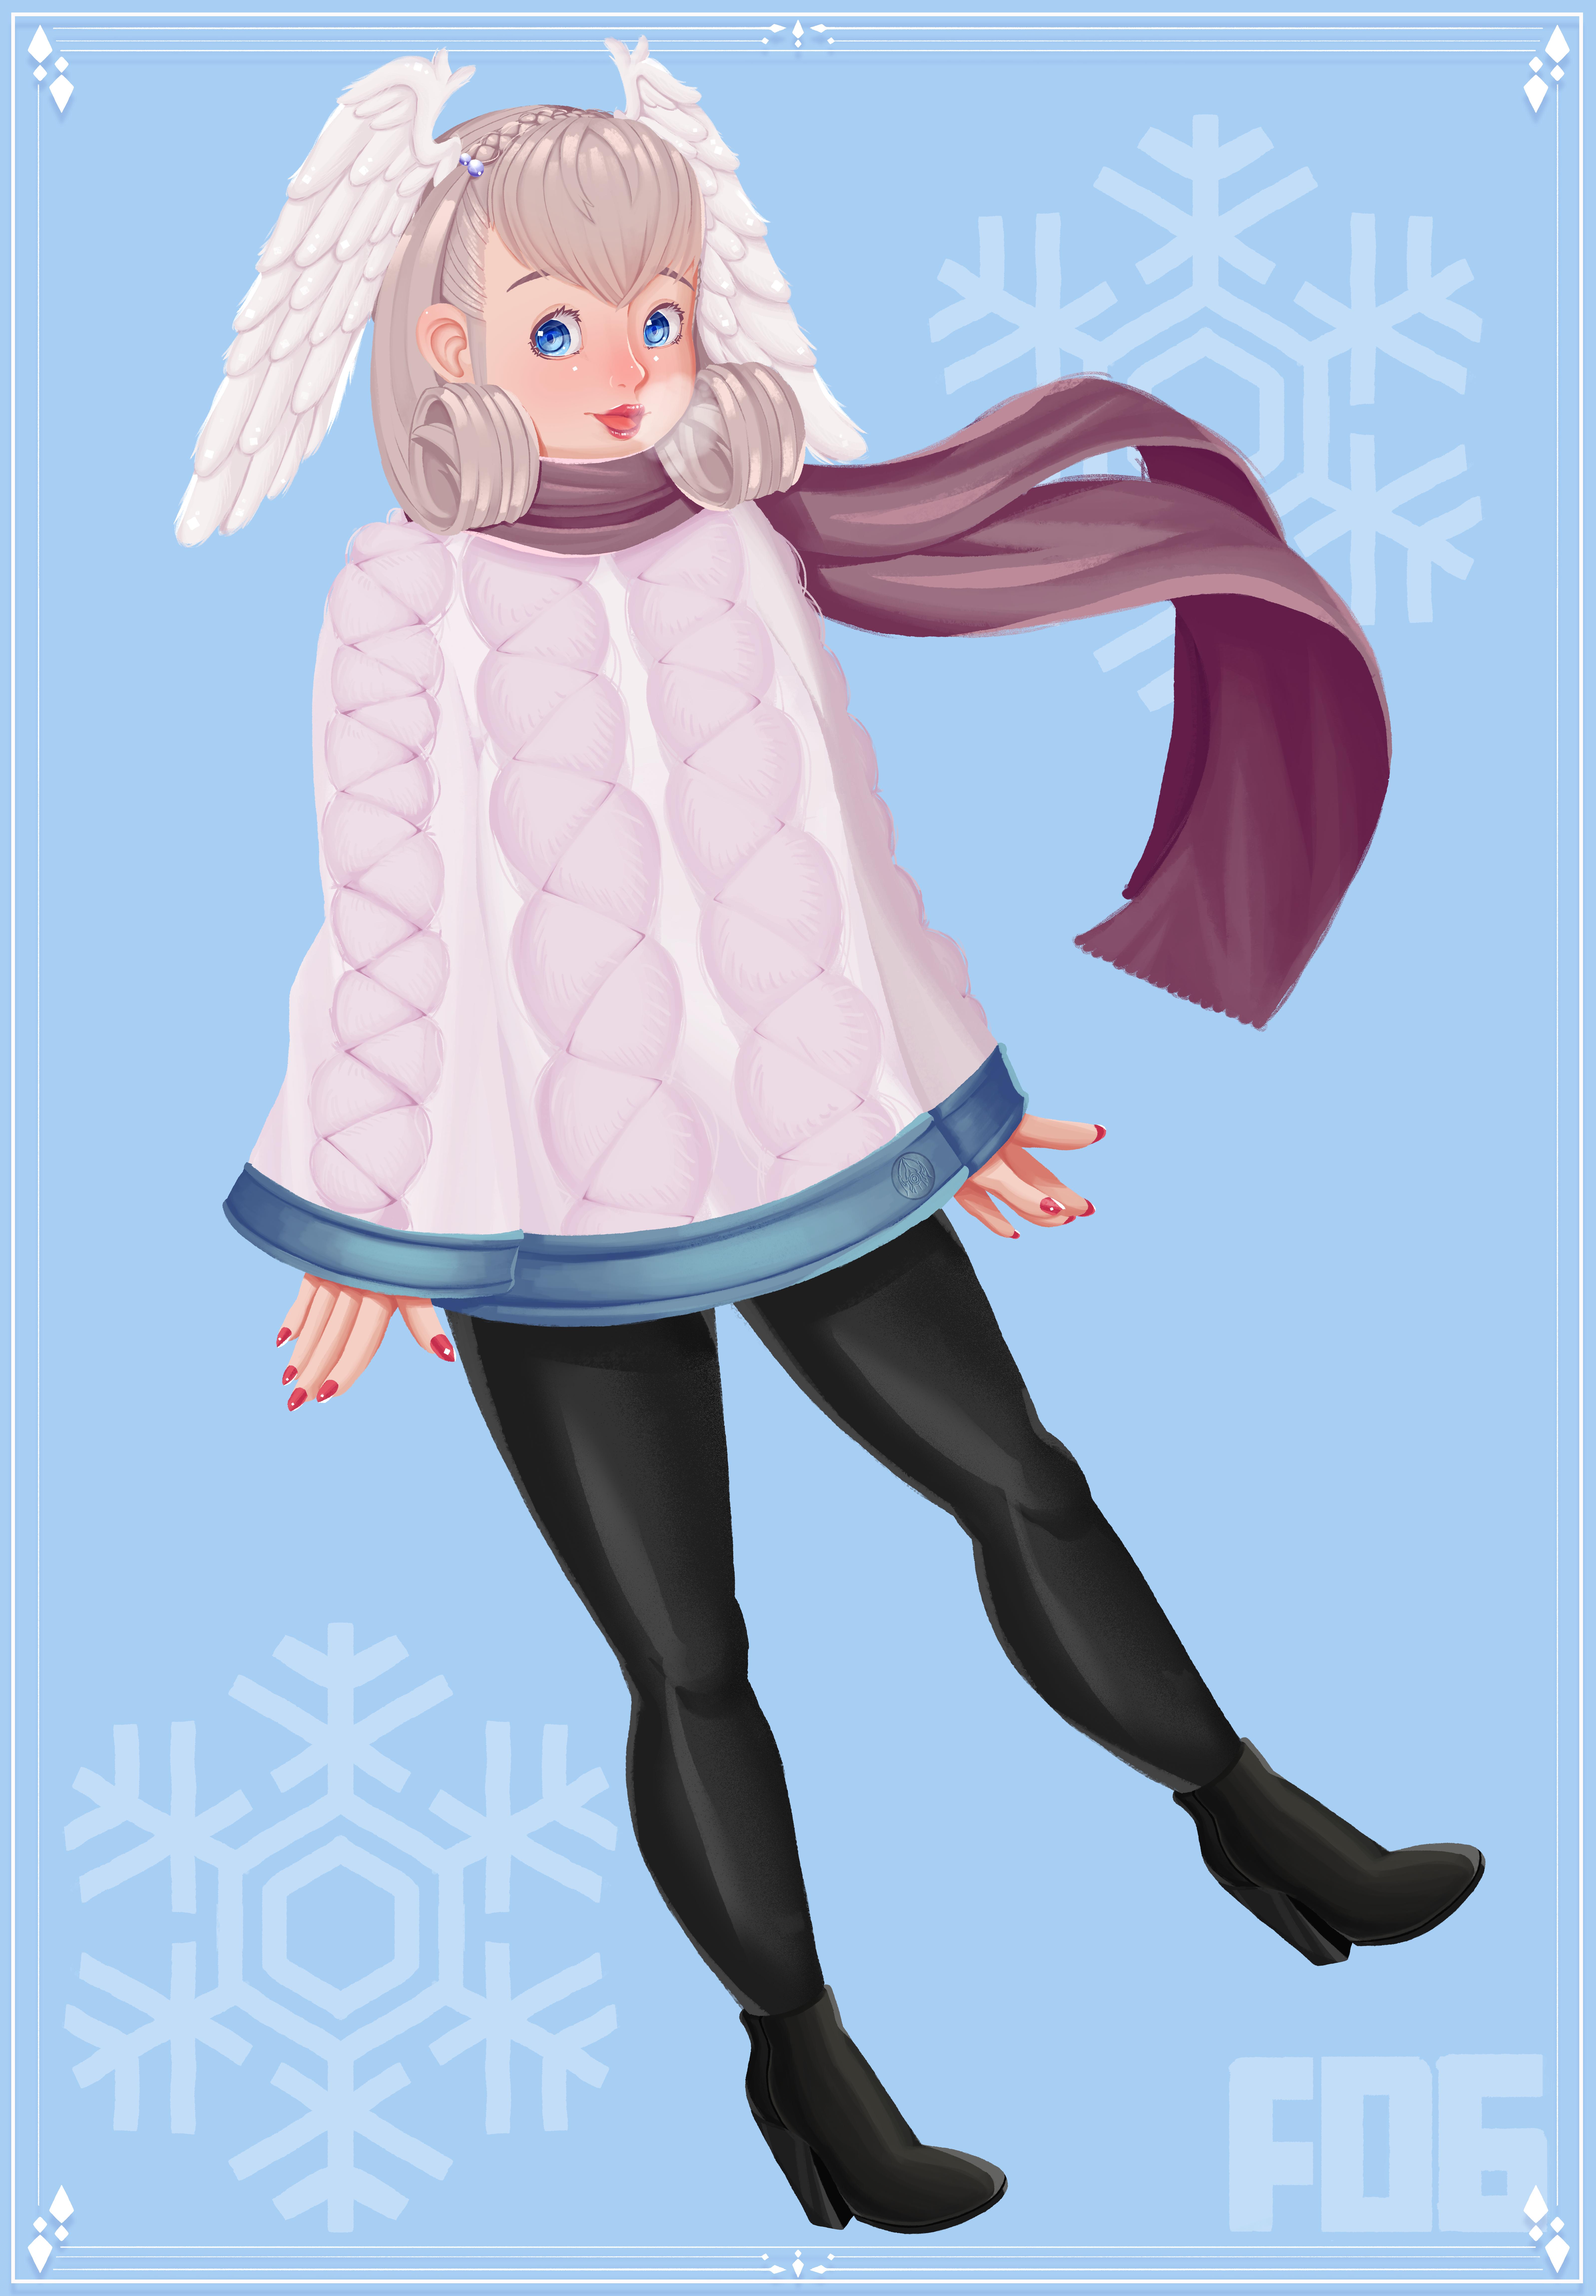 Melia Oversized Sweater